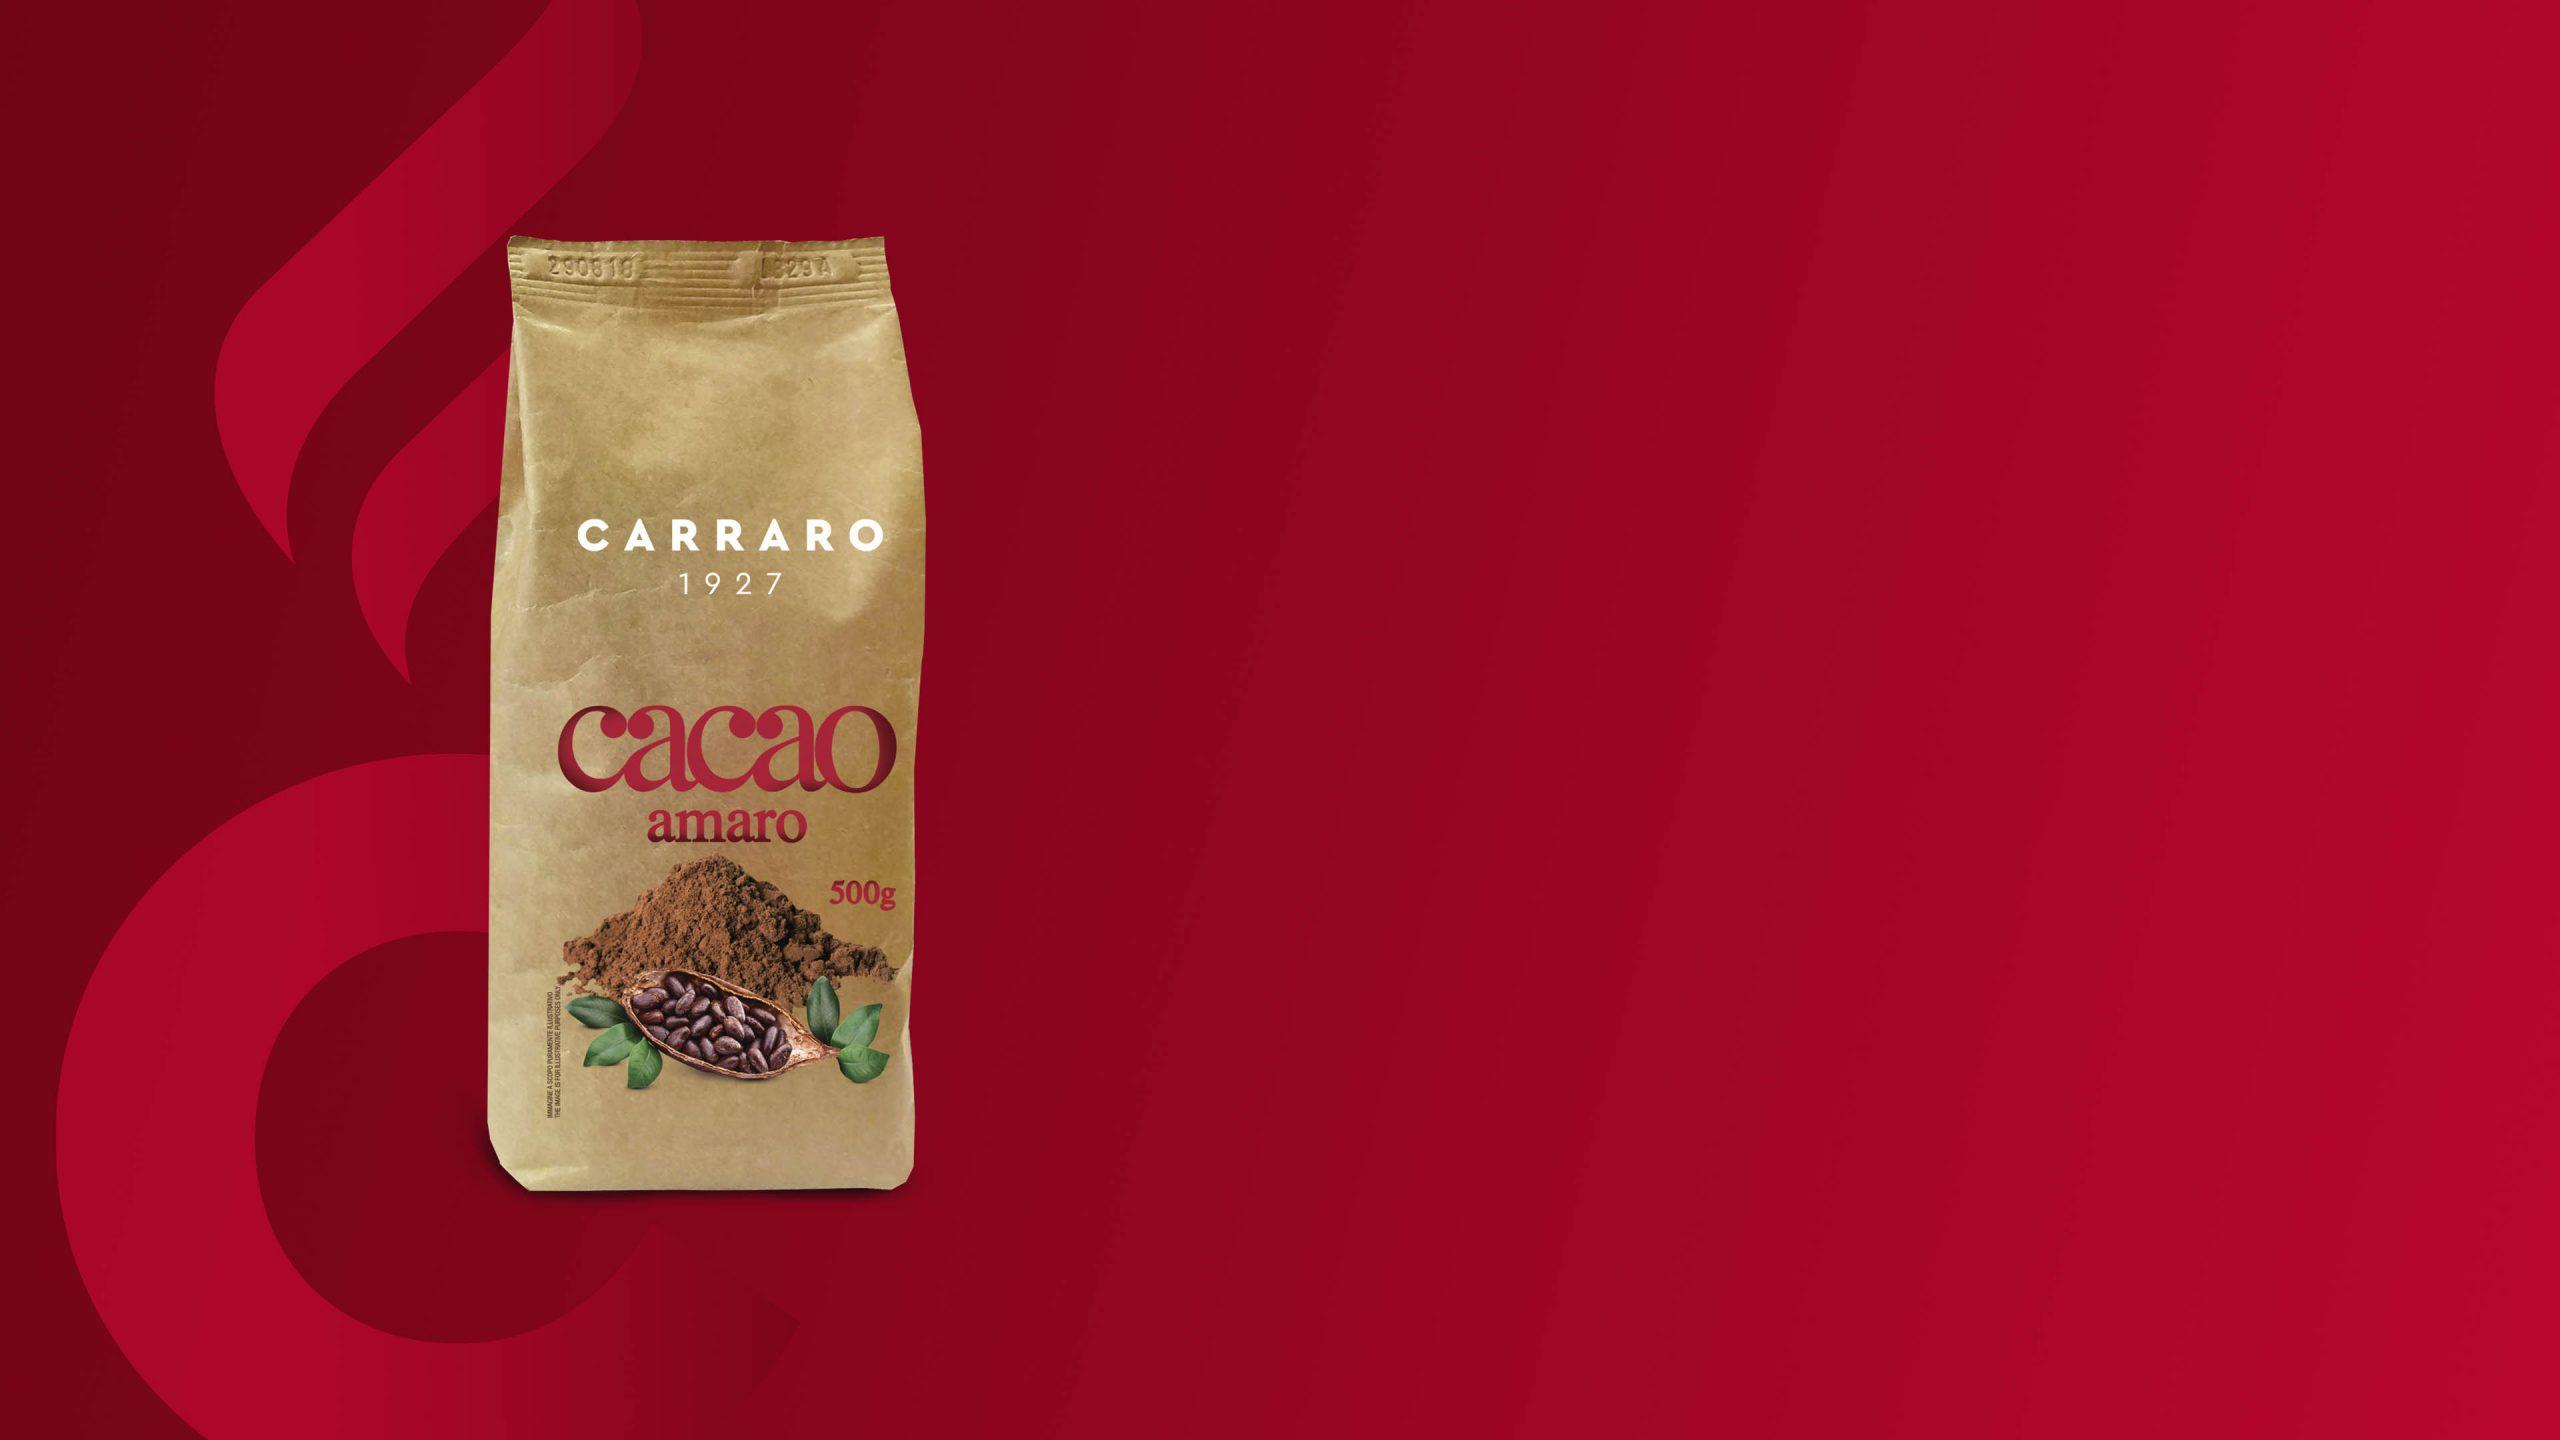 Cacao amaro – 500 g